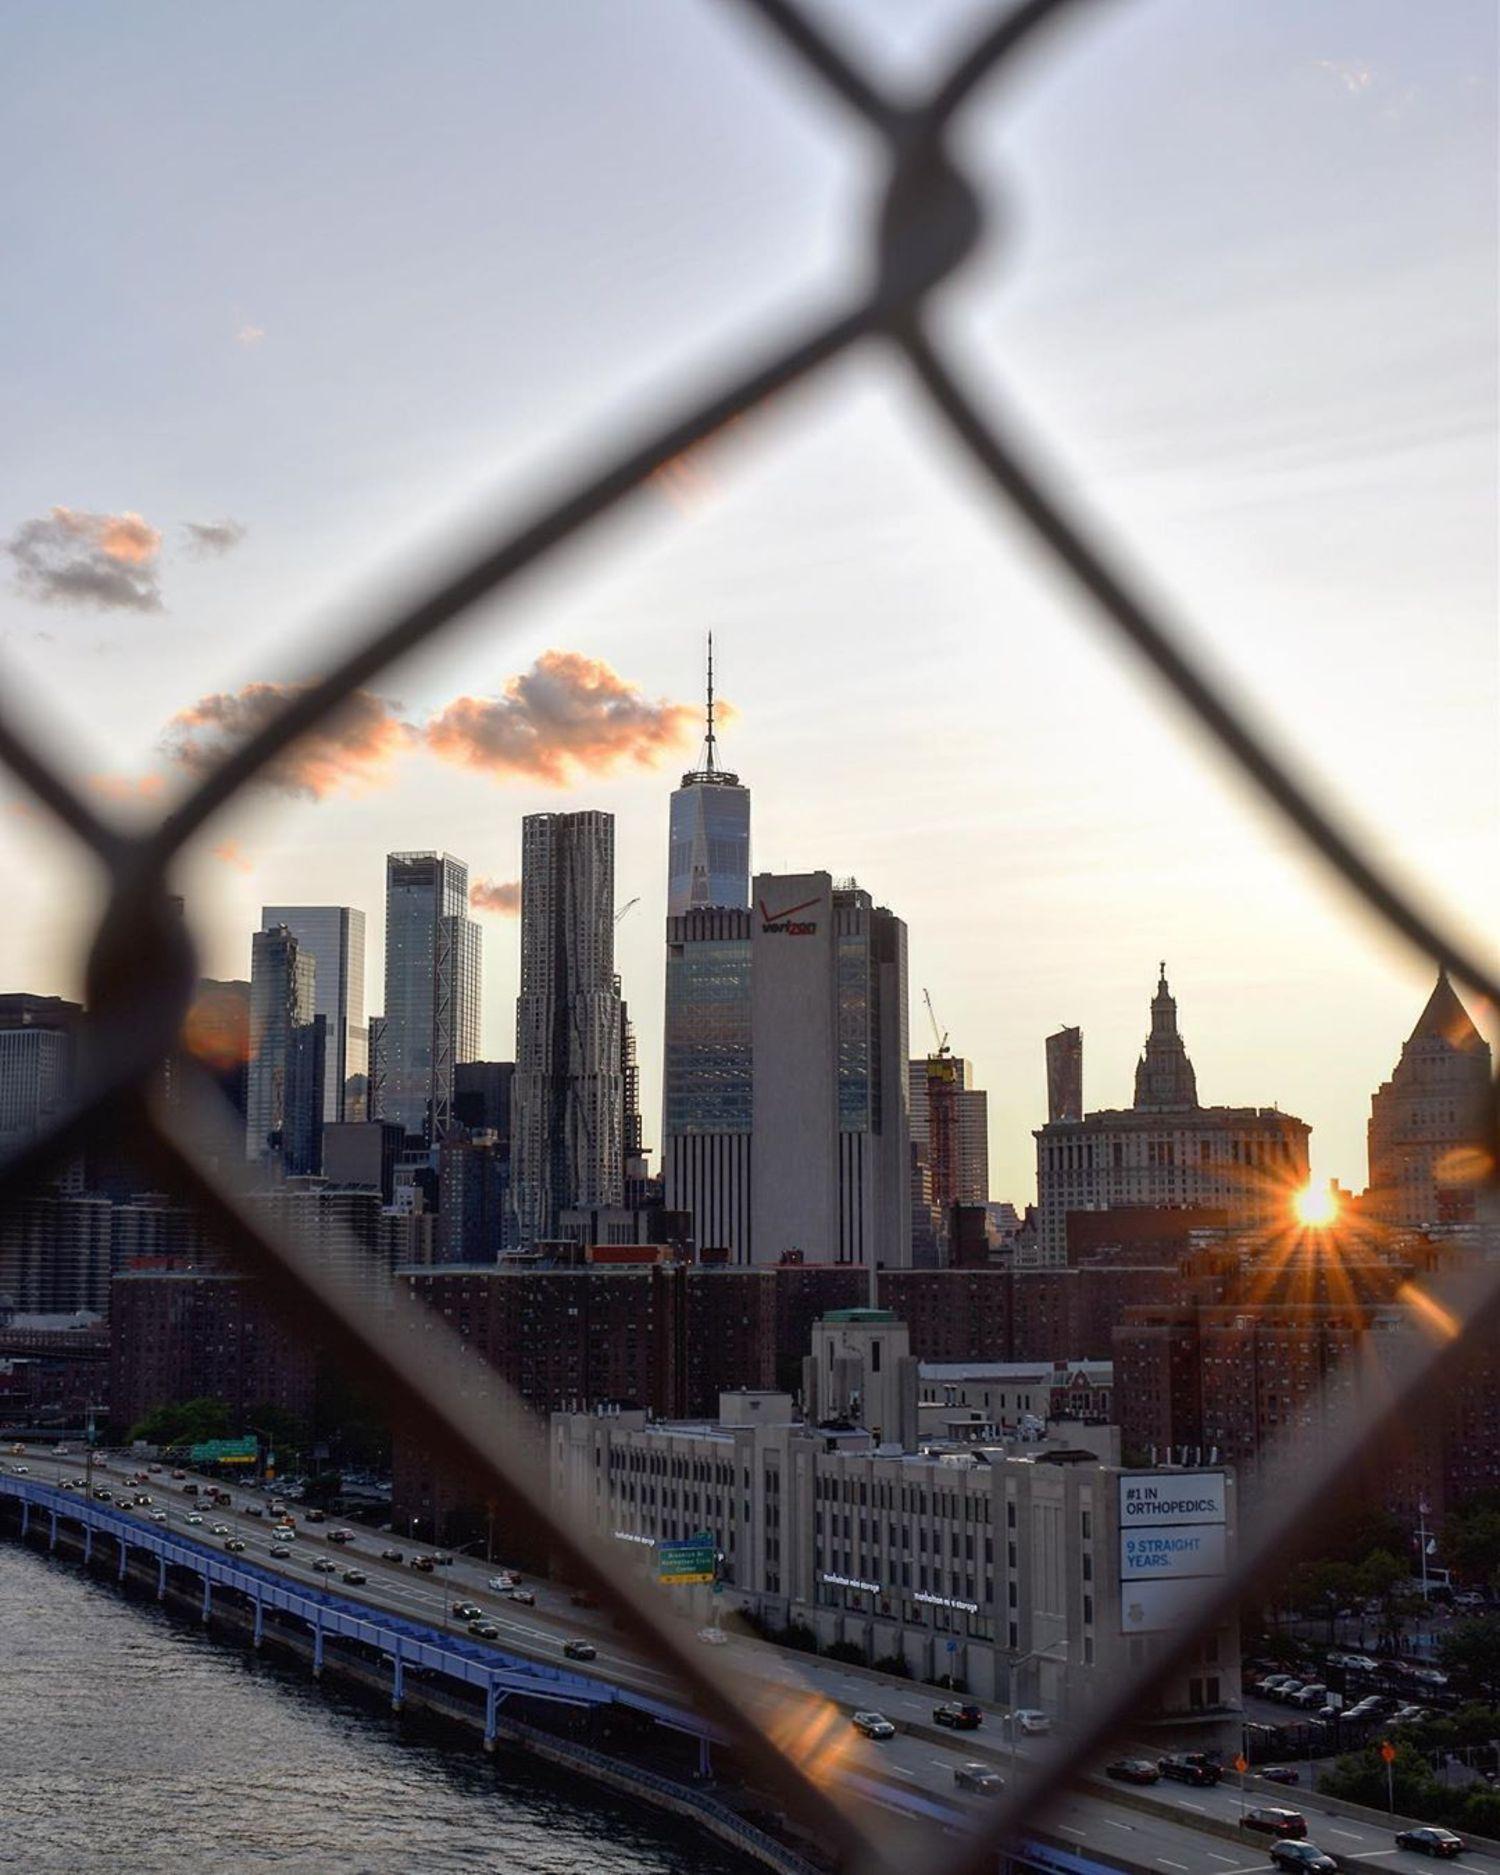 Sunset over Lower Manhattan from Manhattan Bridge